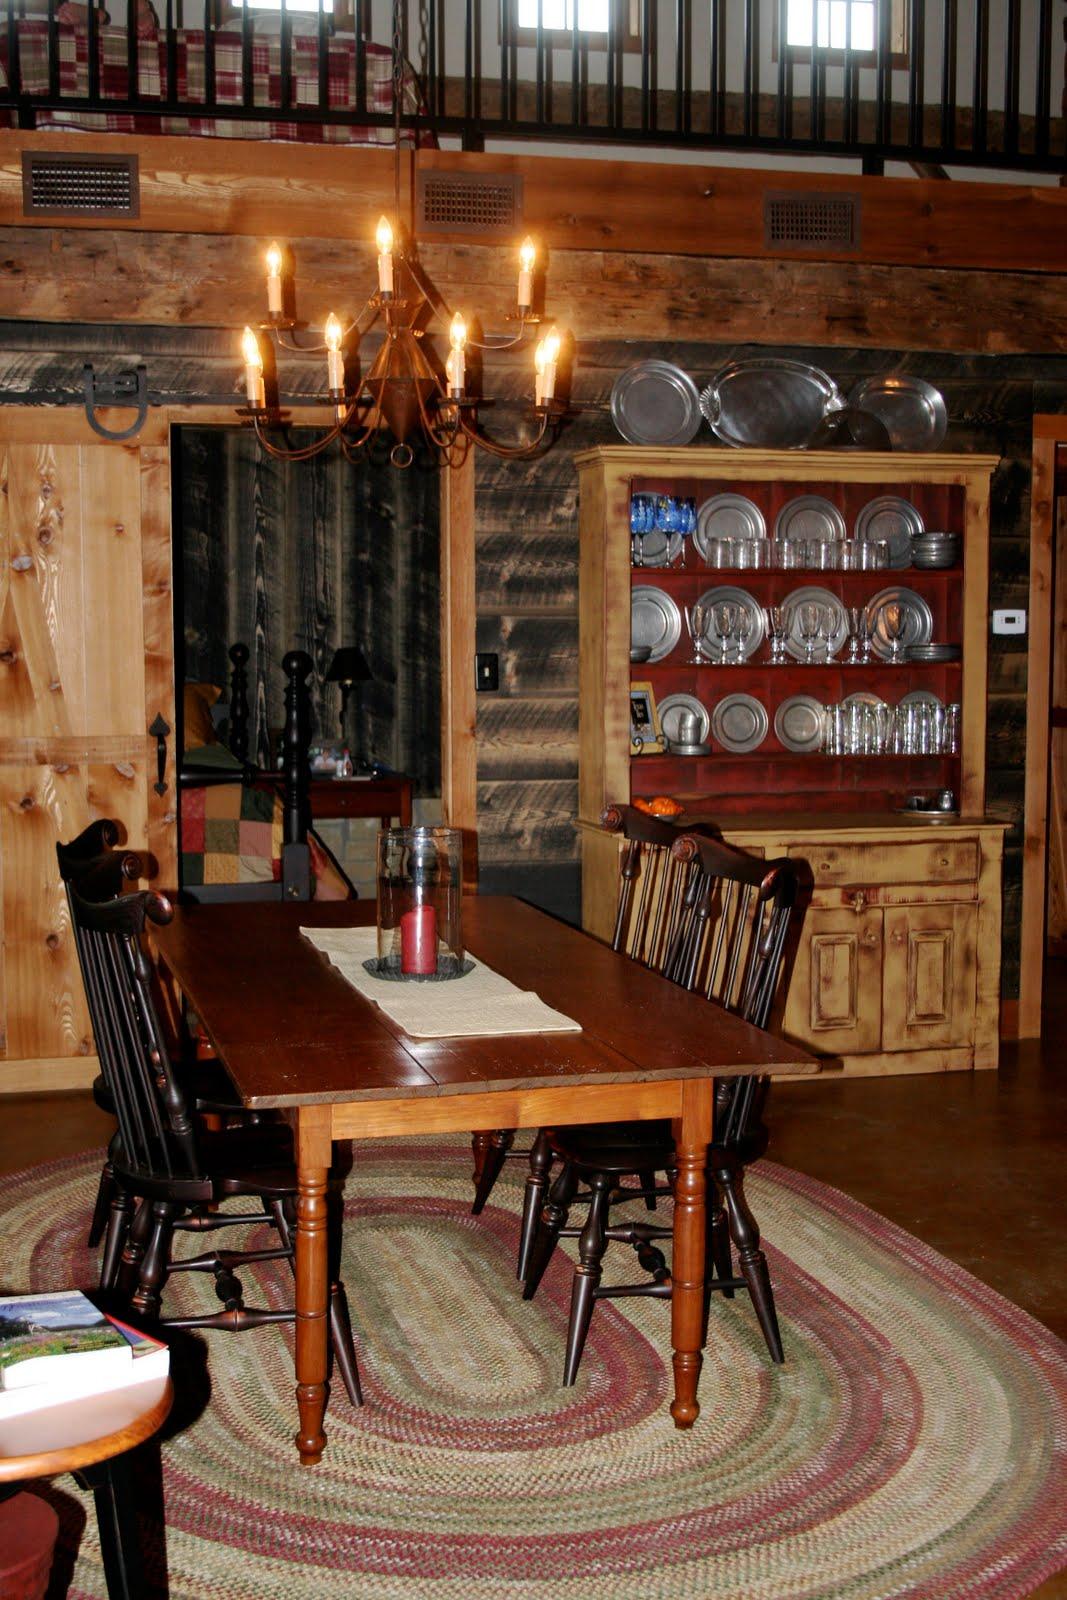 primitive bedroom. Image of primitive bedroom furniture Primitive Bedroom Furniture  modern